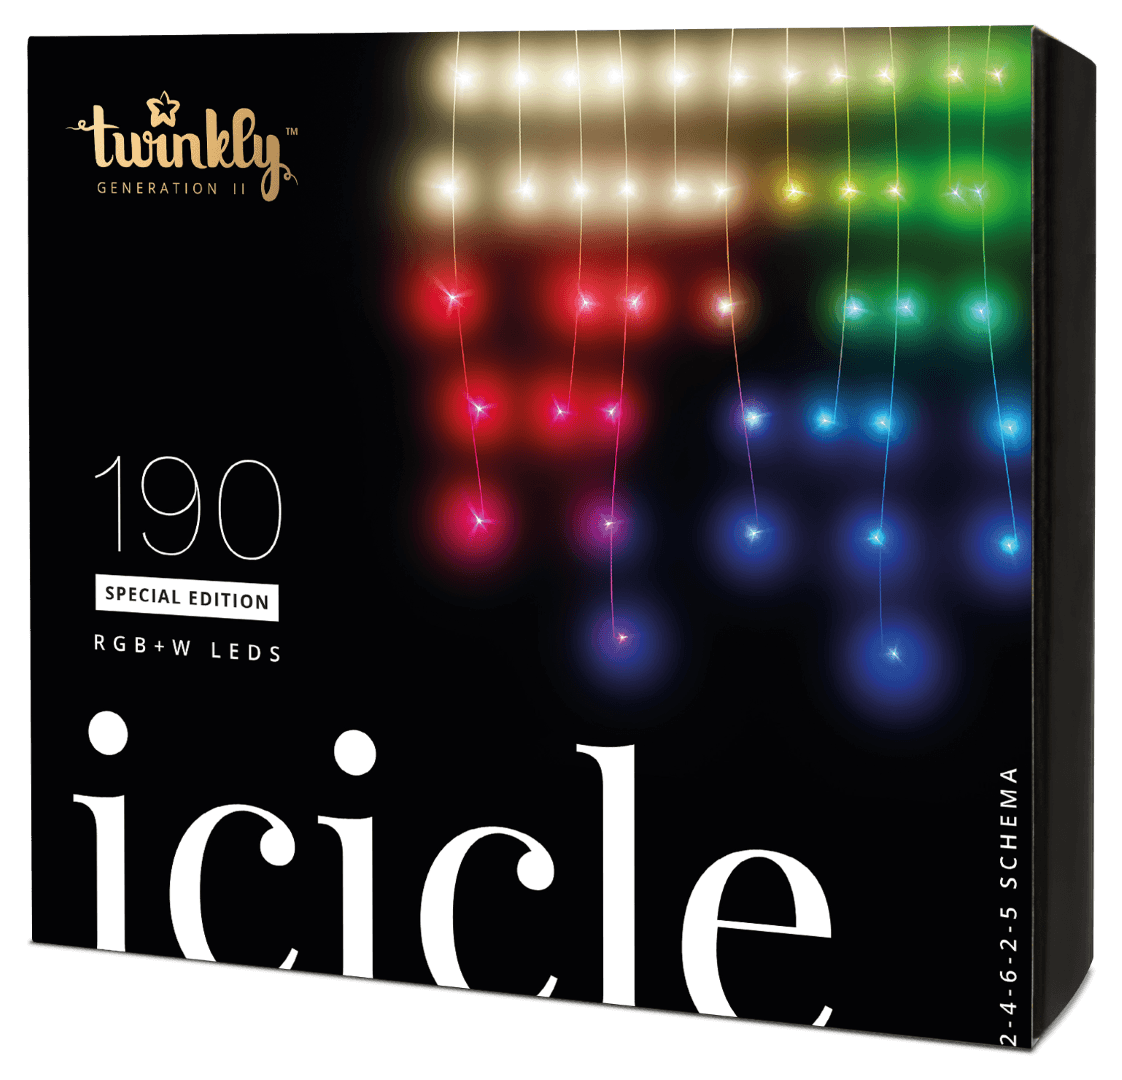 Twinkly 190 RGB W LEDs Icicle Lights - Generation II